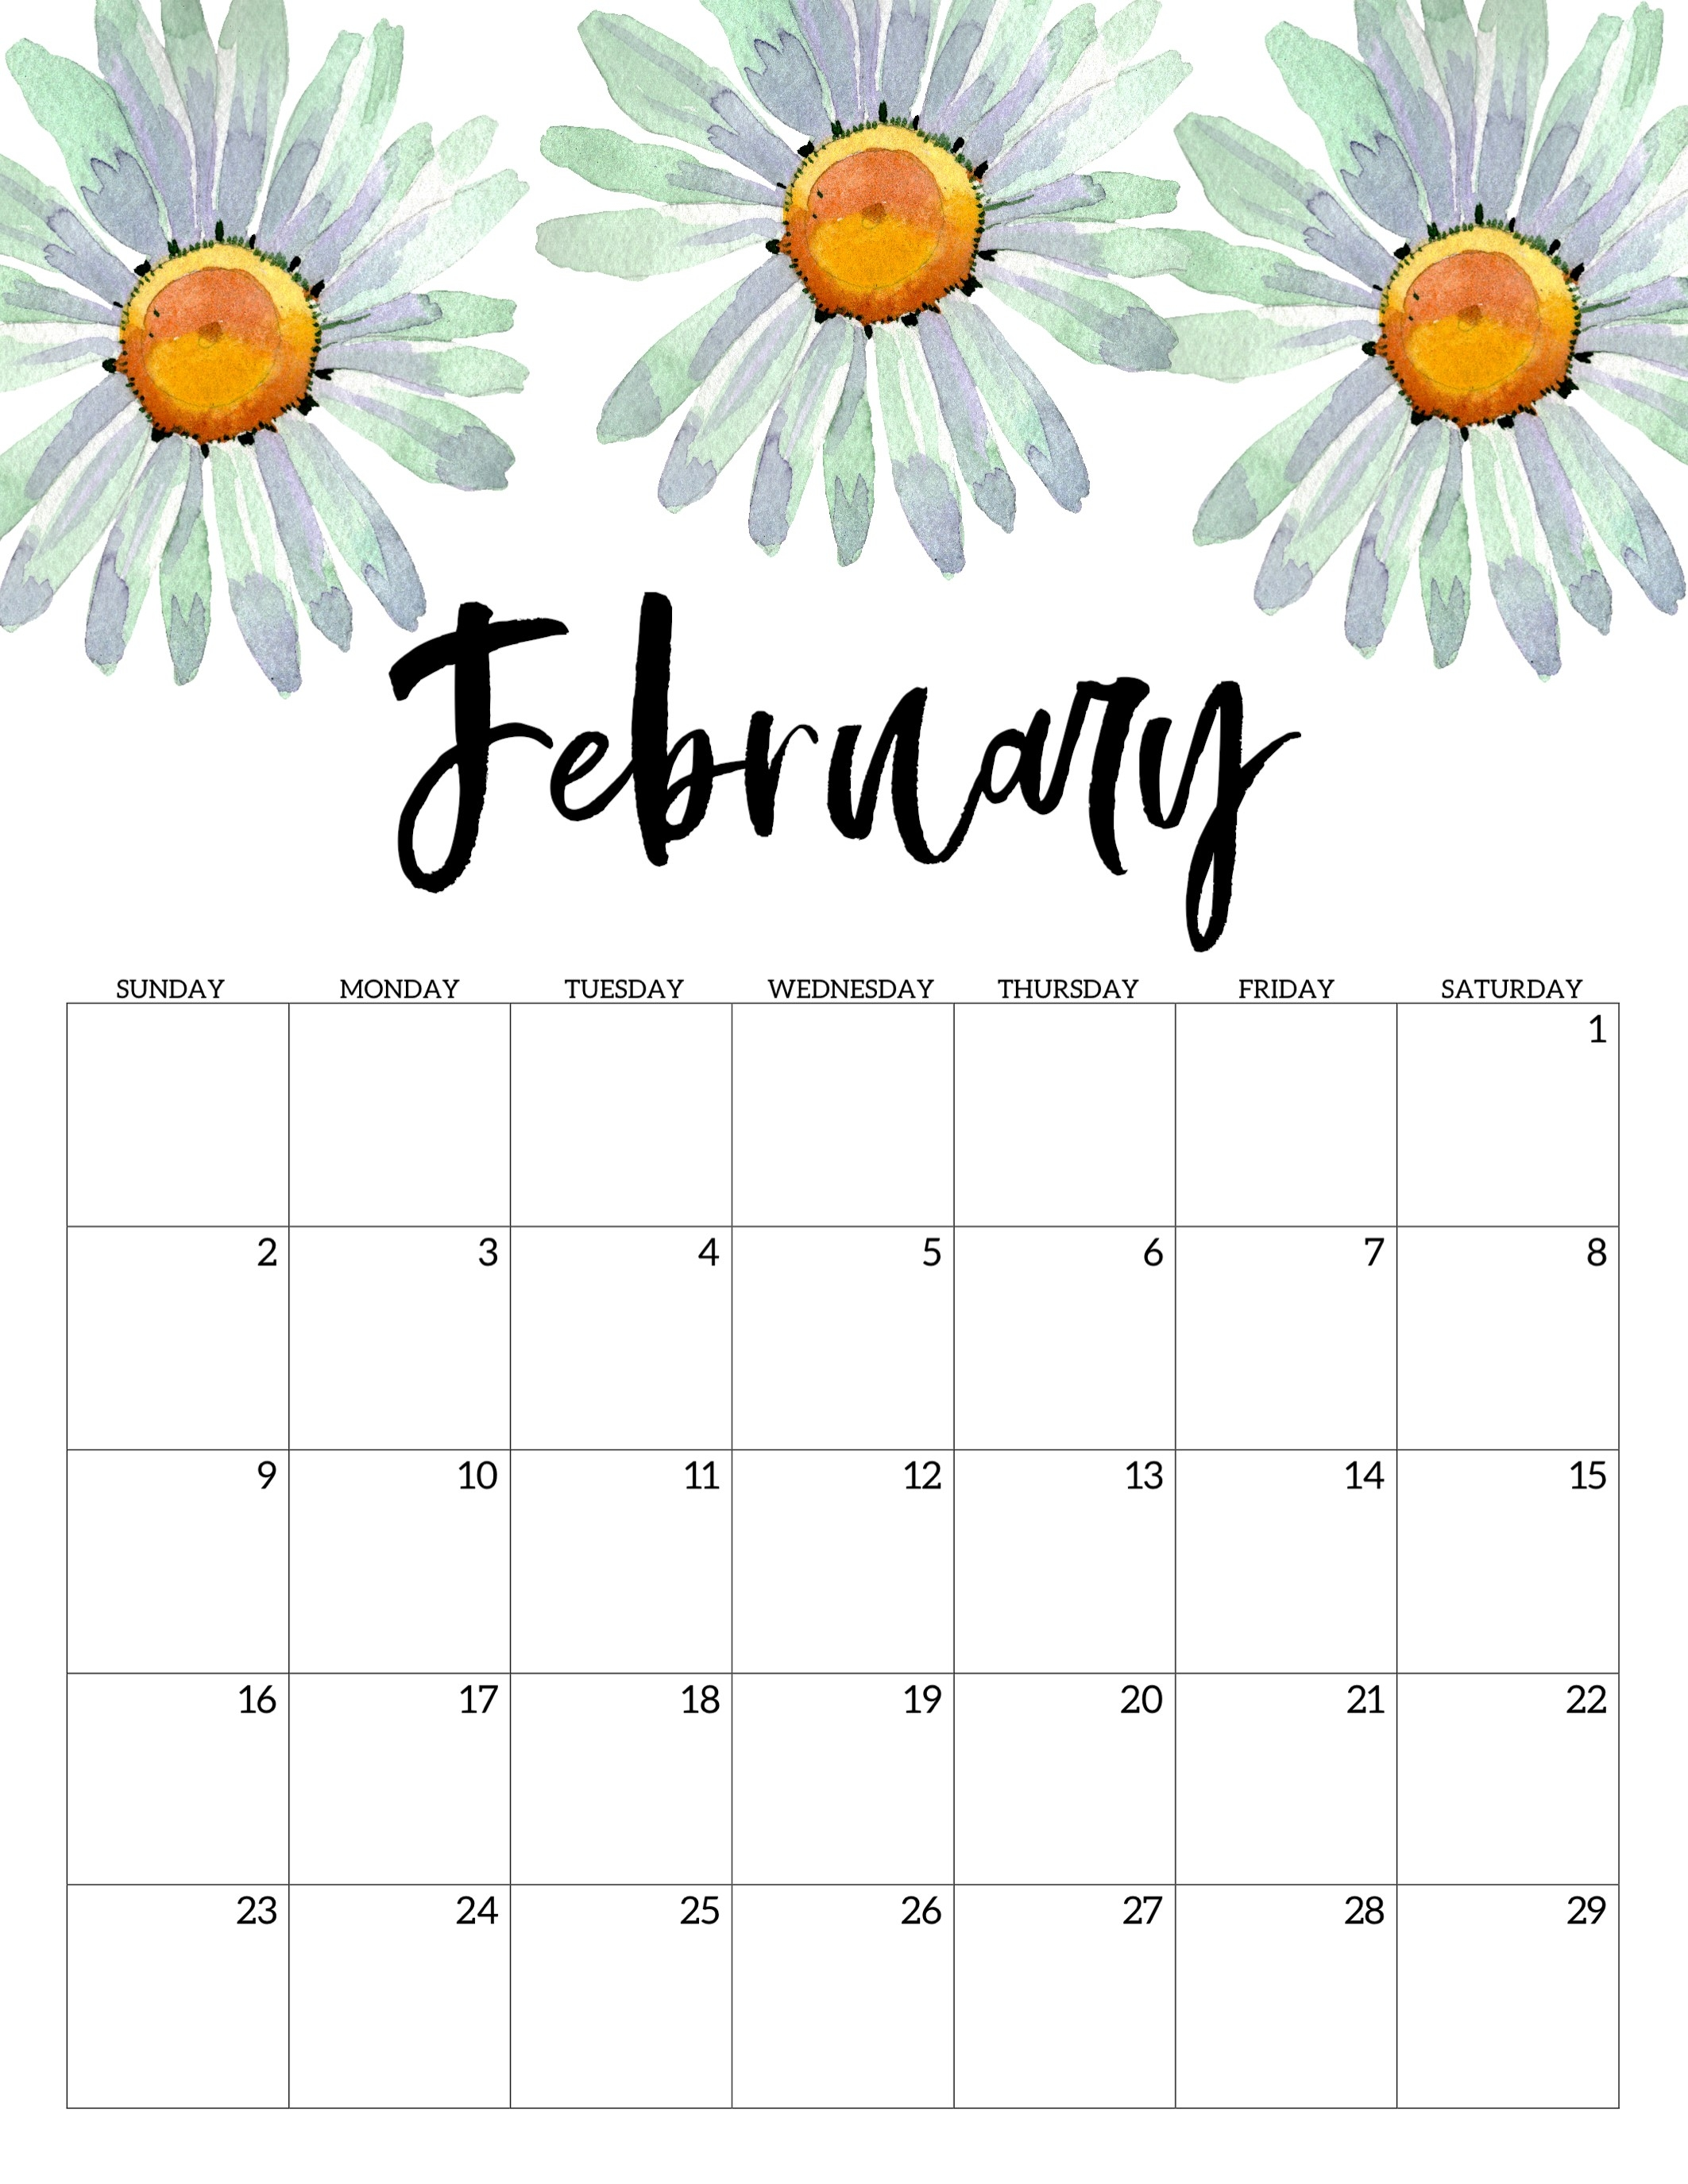 2020 Free Printable Calendar - Floral - Paper Trail Design-Cute January 2020 Calendar